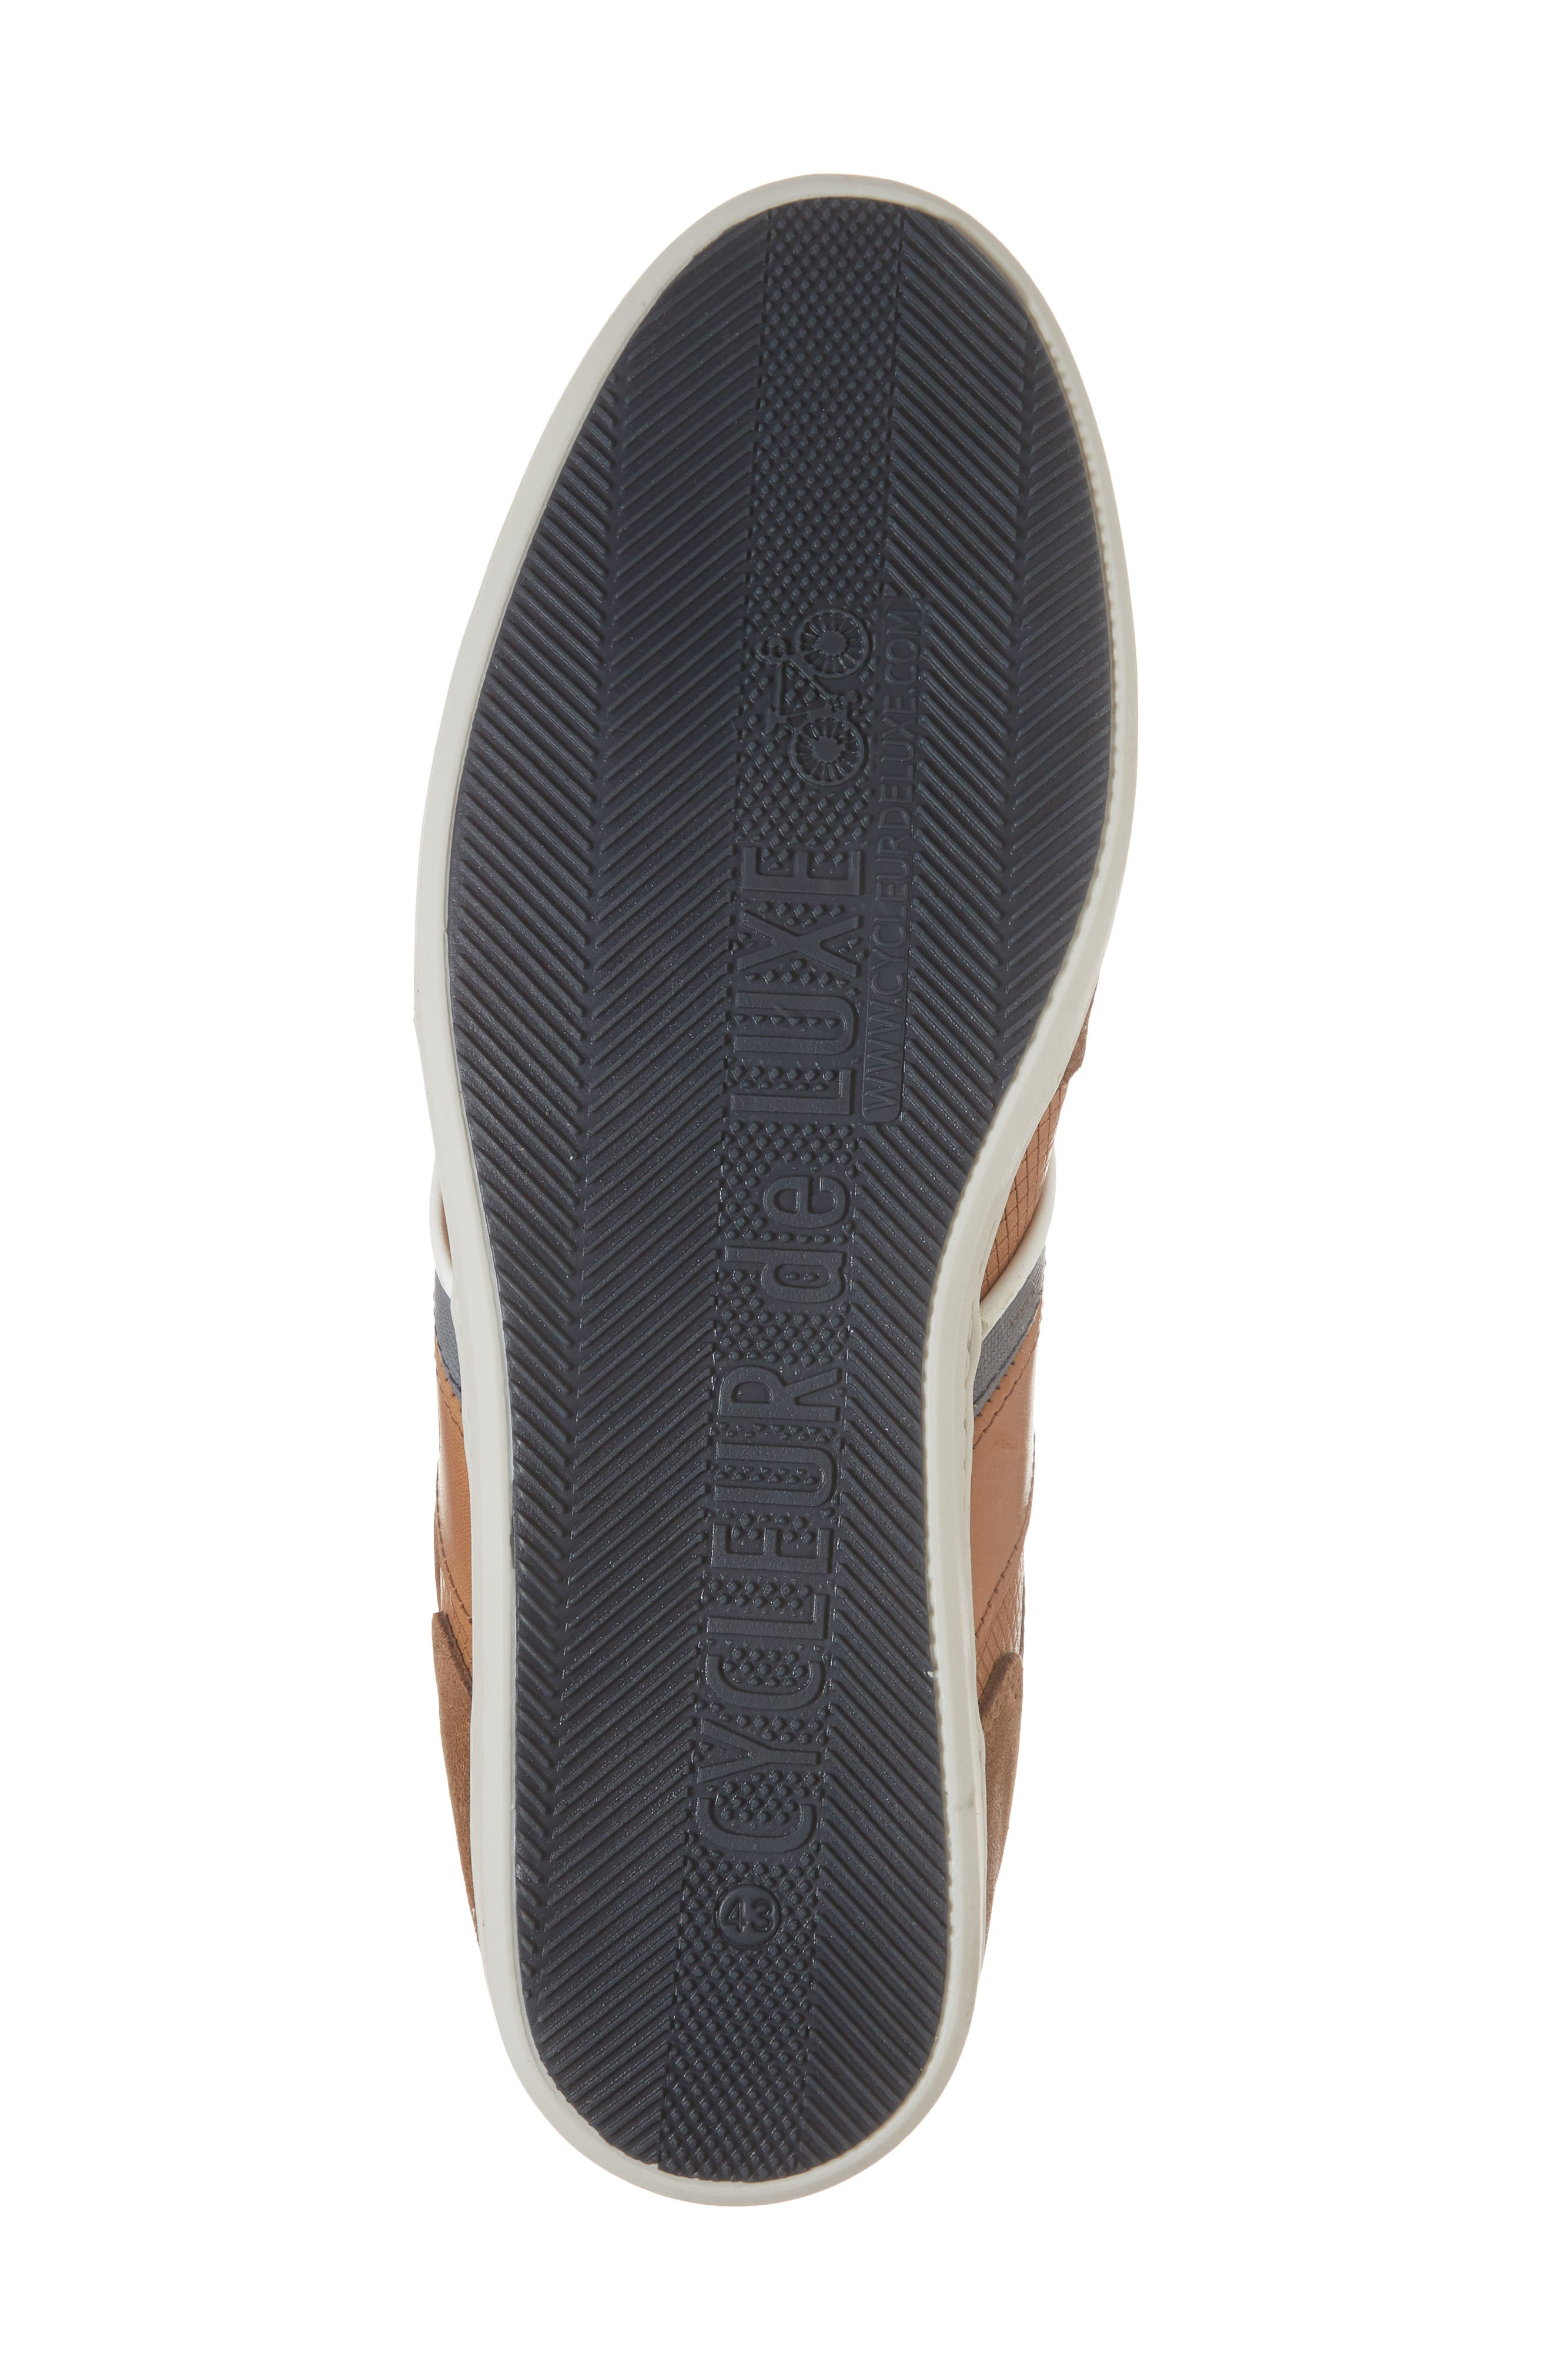 Bahamas Low Top Sneaker,                             Alternate thumbnail 6, color,                             COGNAC LEATHER